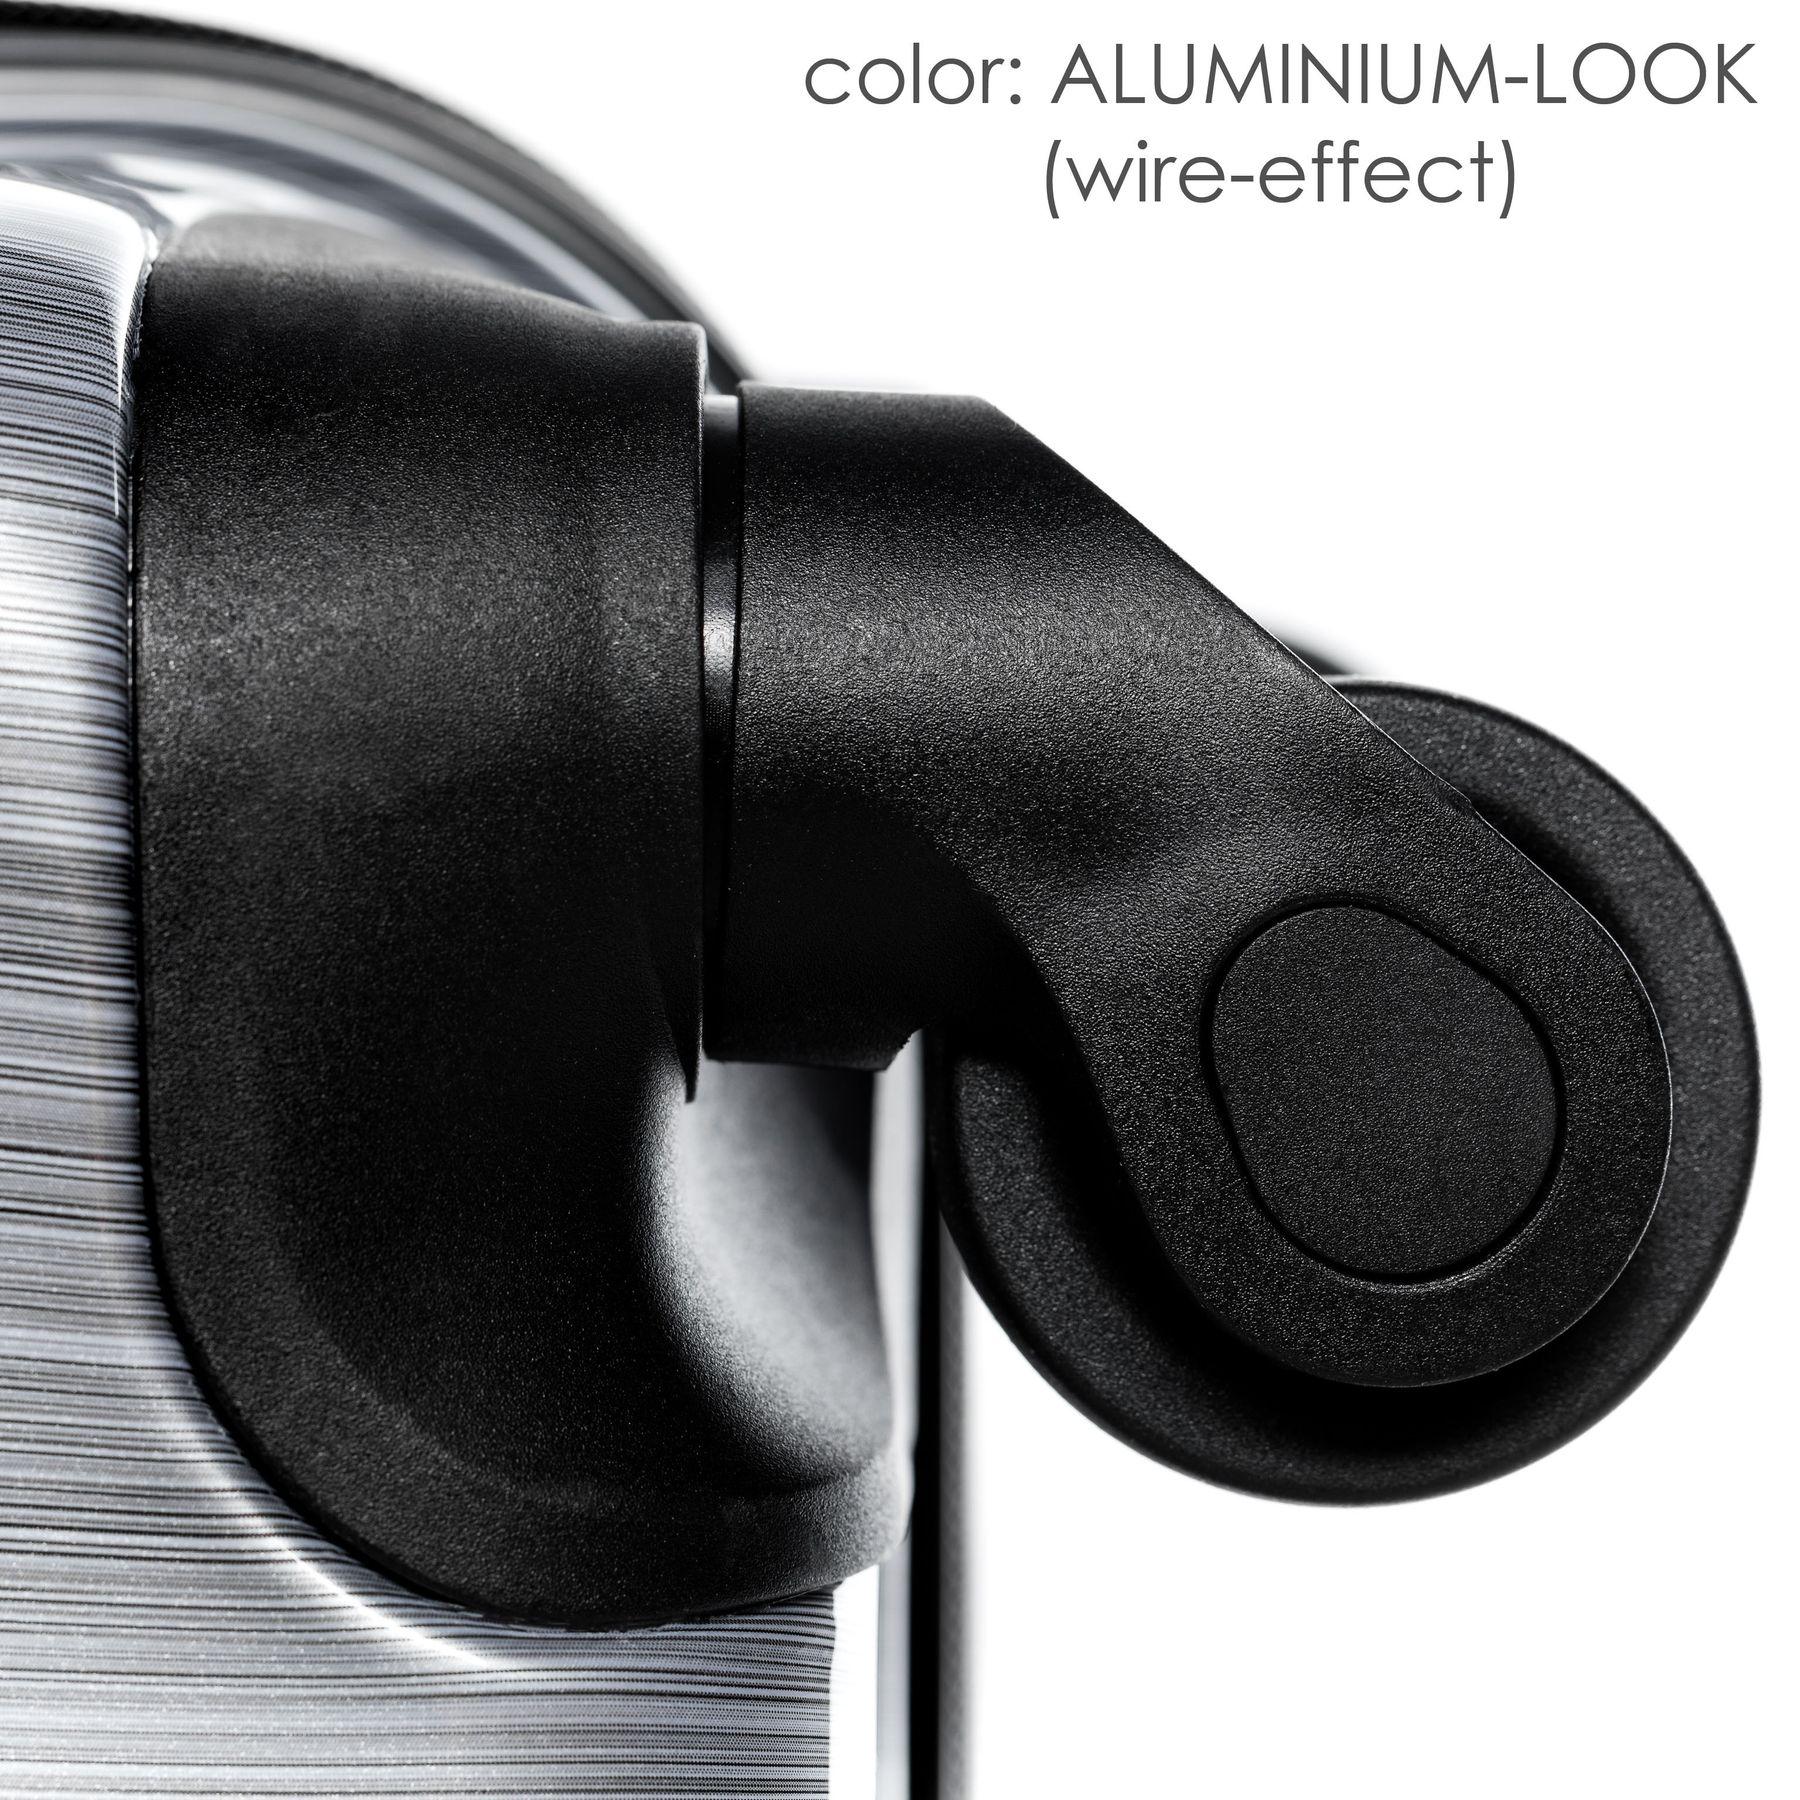 ferg kofferset 3 teilig hartschale dijon graphite. Black Bedroom Furniture Sets. Home Design Ideas